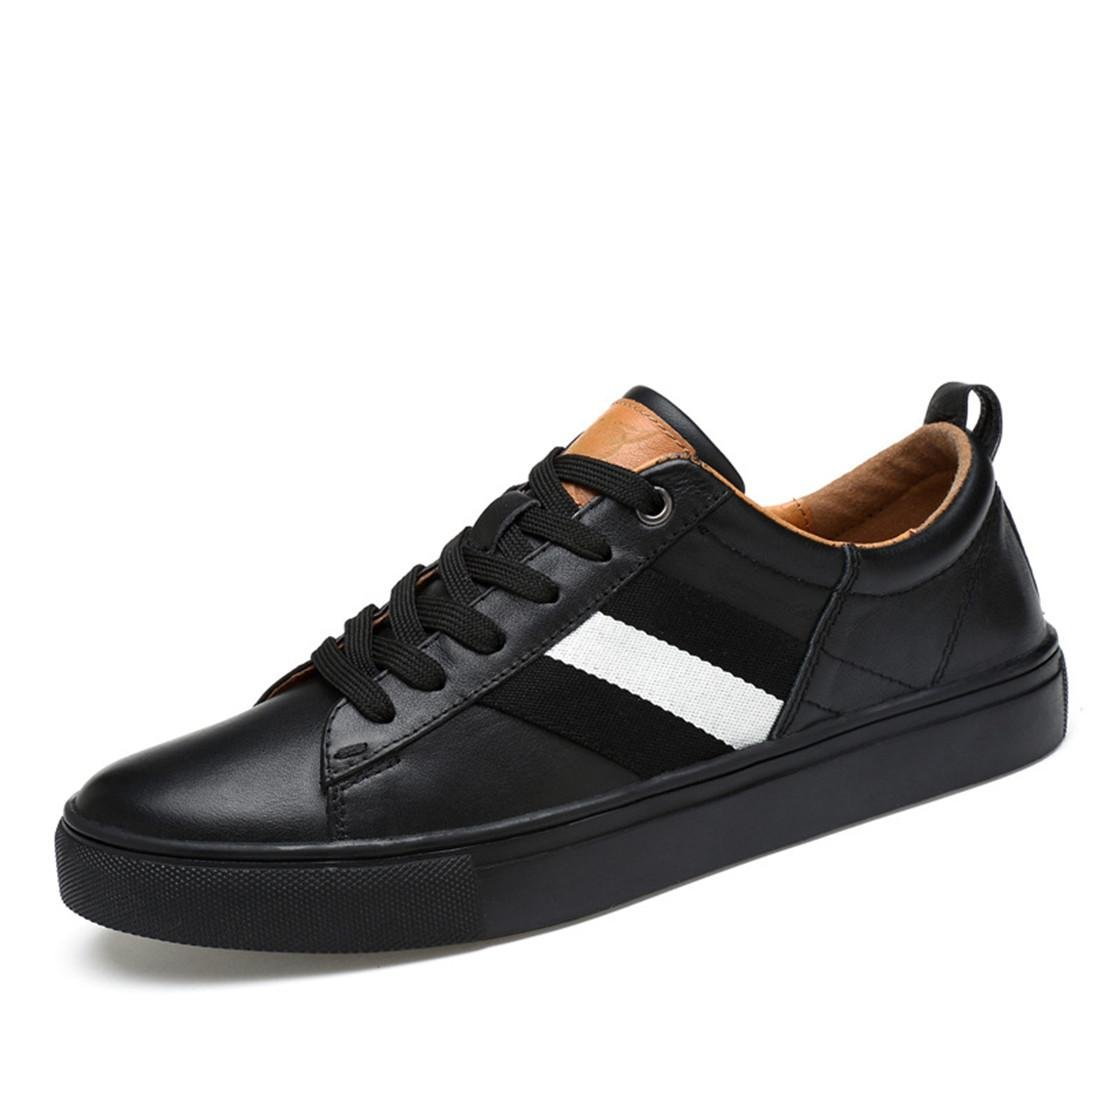 Herren Flache Schuhe Mode Rutschfest Sportschuhe Atmungsaktiv Lässige Schuhe Ausbilder Laufschuhe Große Größe EUR GRÖSSE 39-46